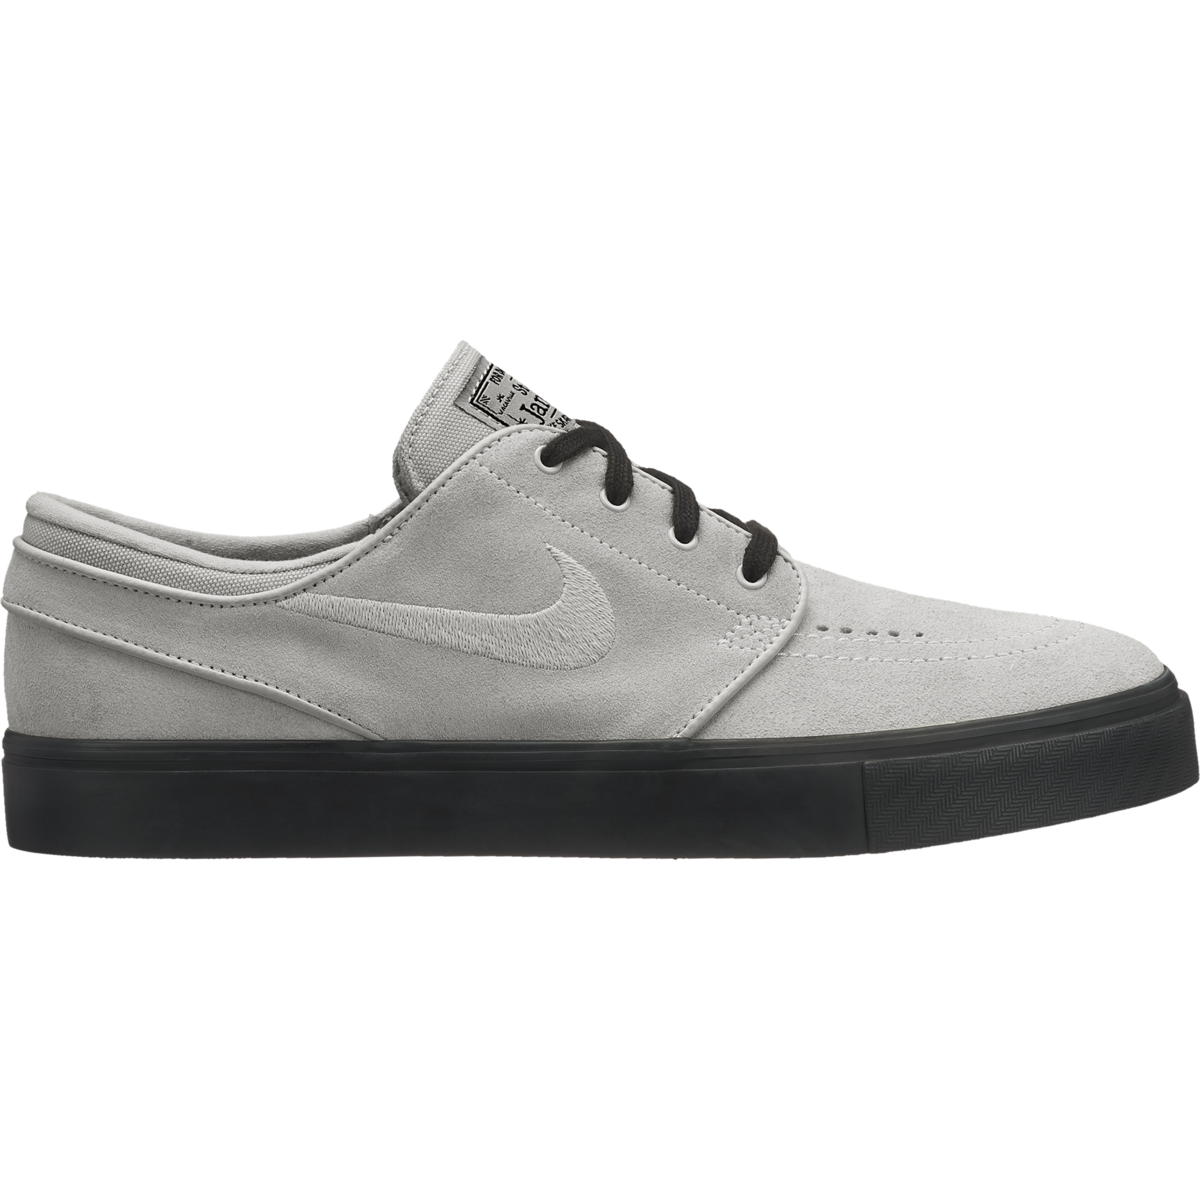 734887829004 Nike SB Stefan Janoski - Vast Grey Black Thumbnail